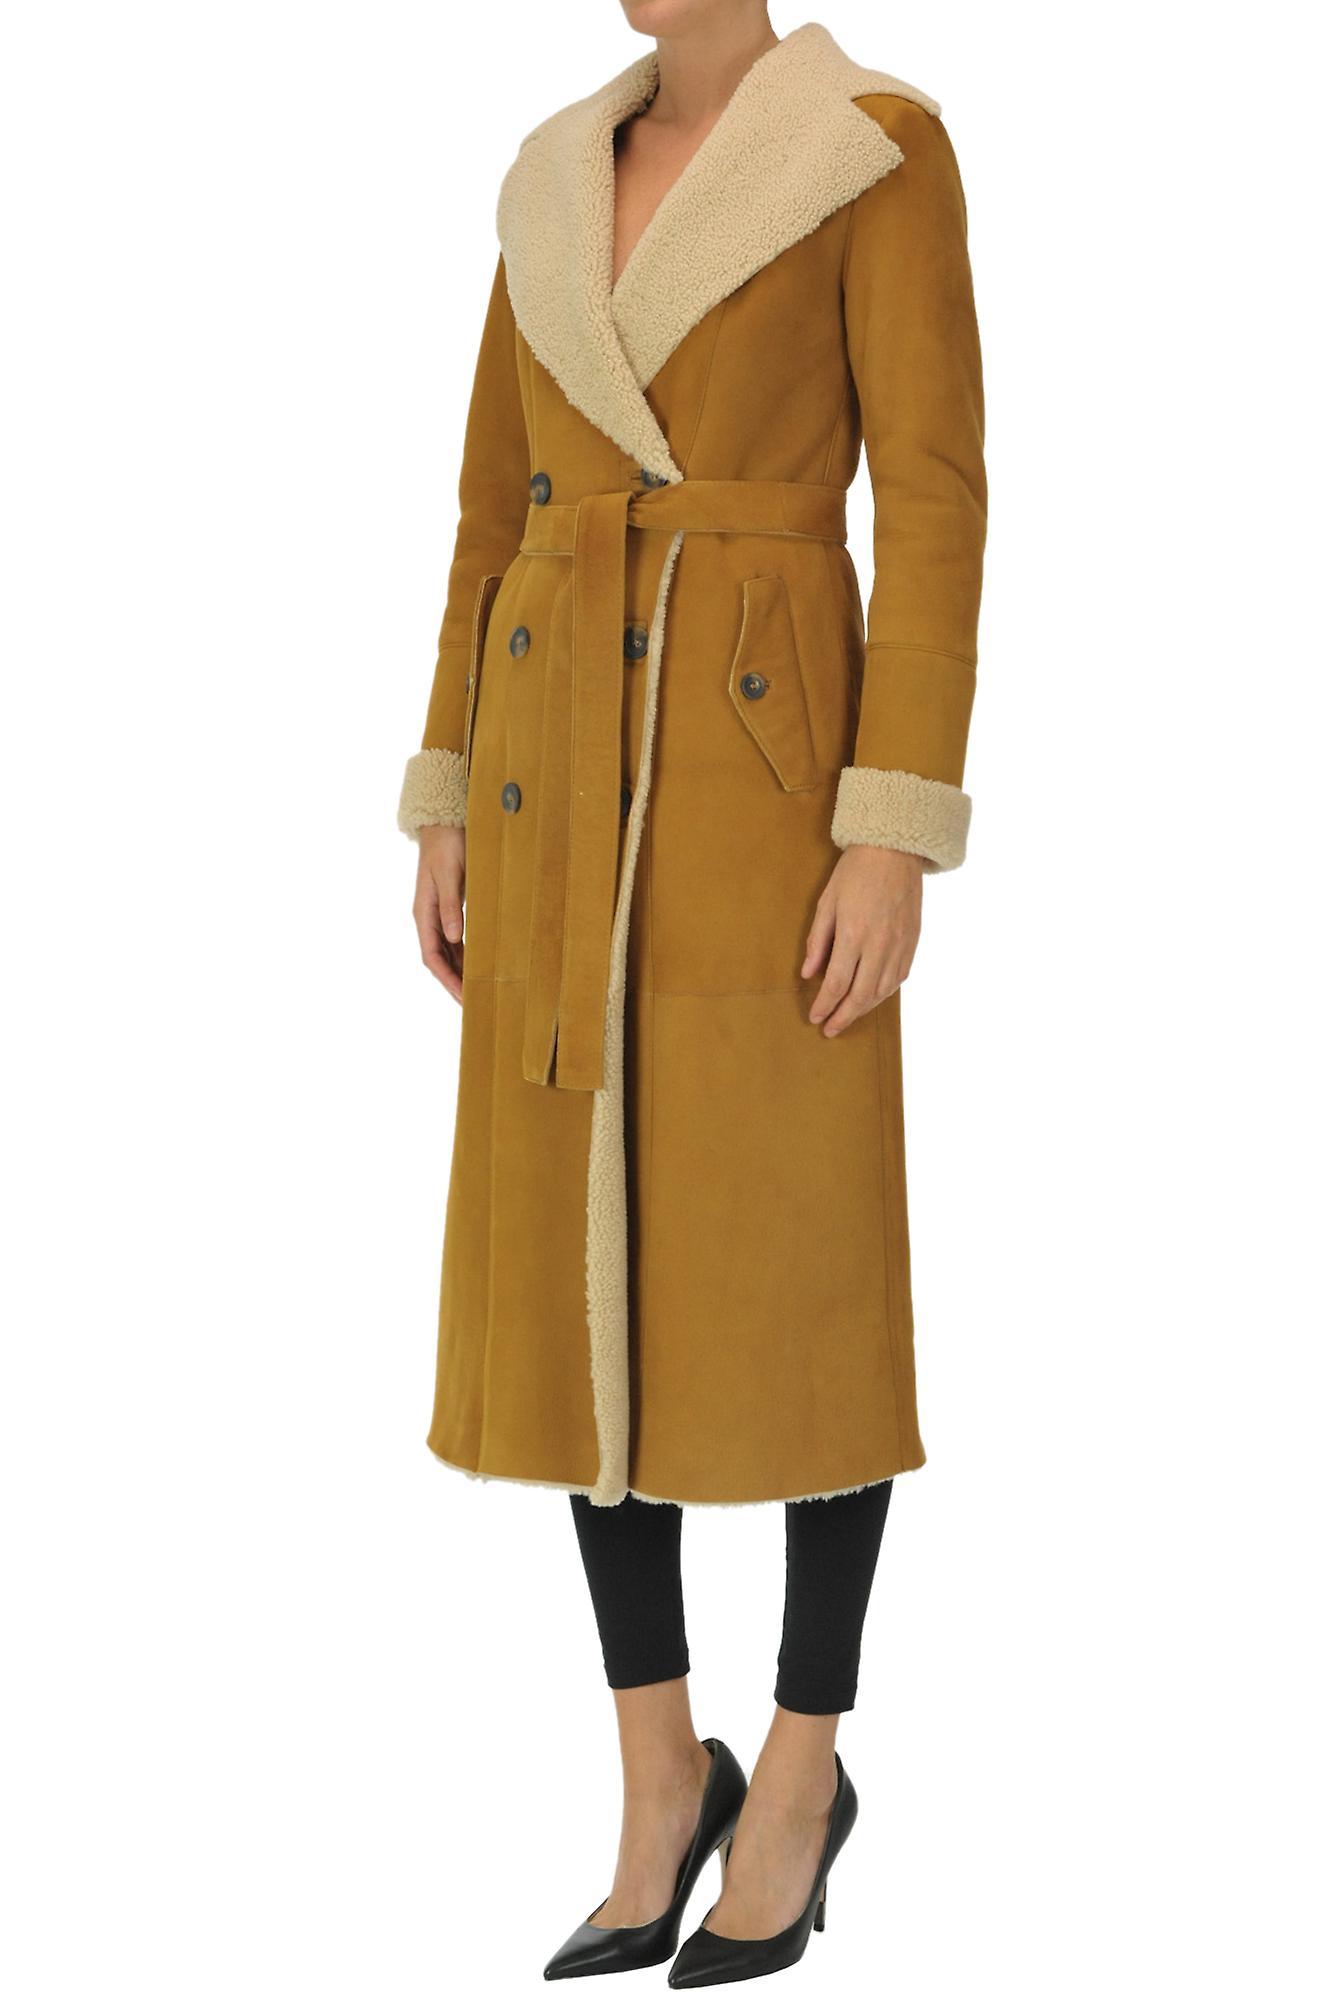 Desa 1972 Ezgl357009 Women's Brown Leather Coat